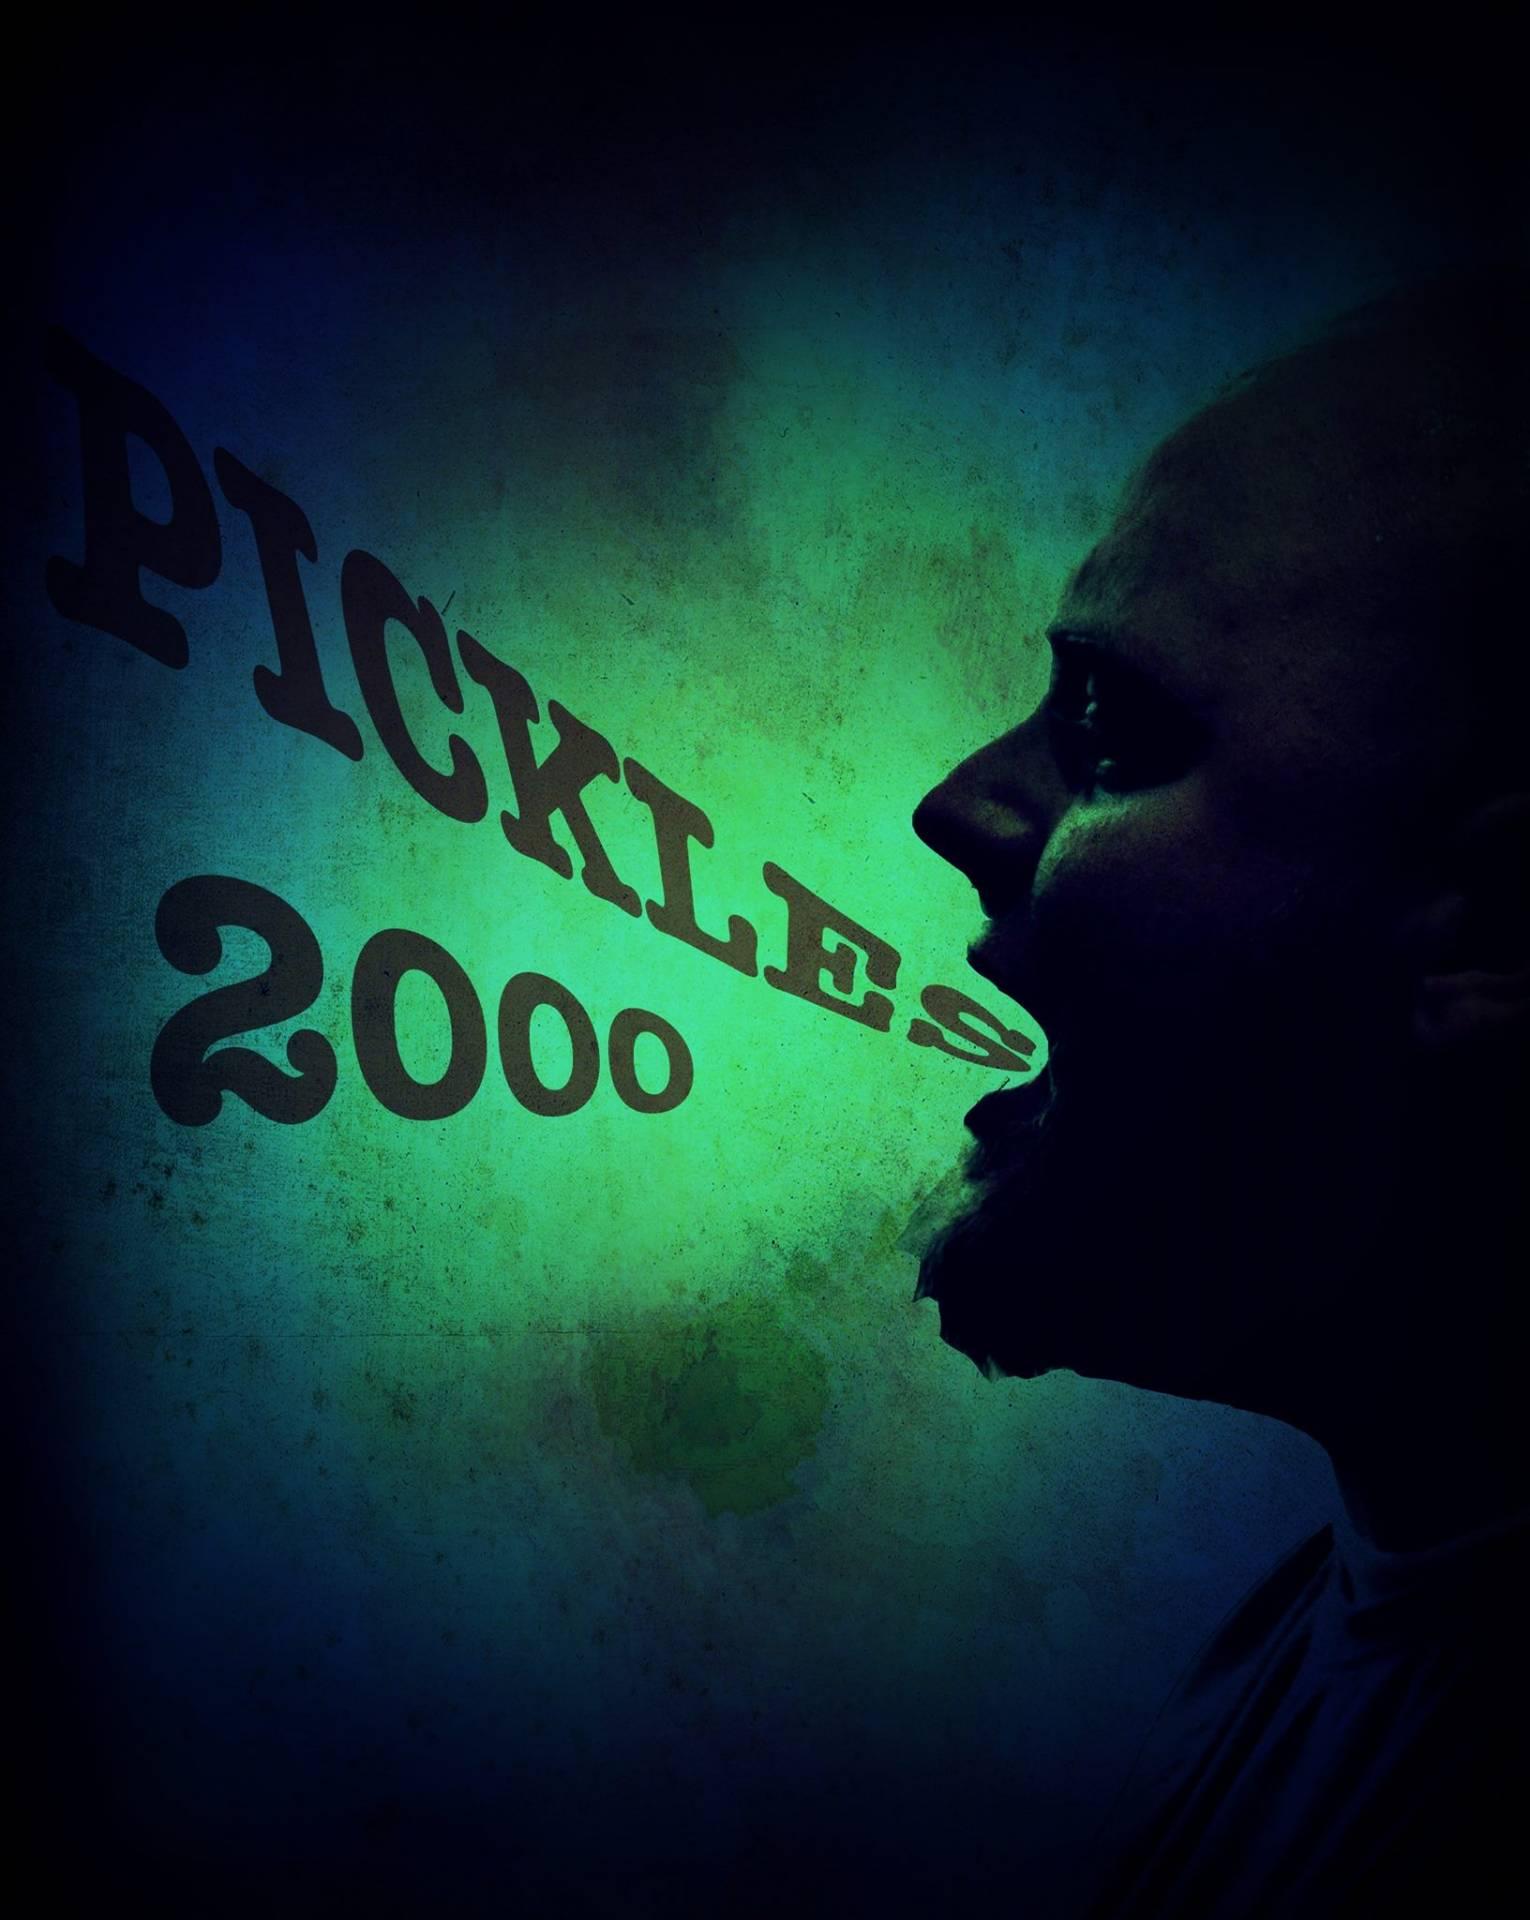 Pickles2000